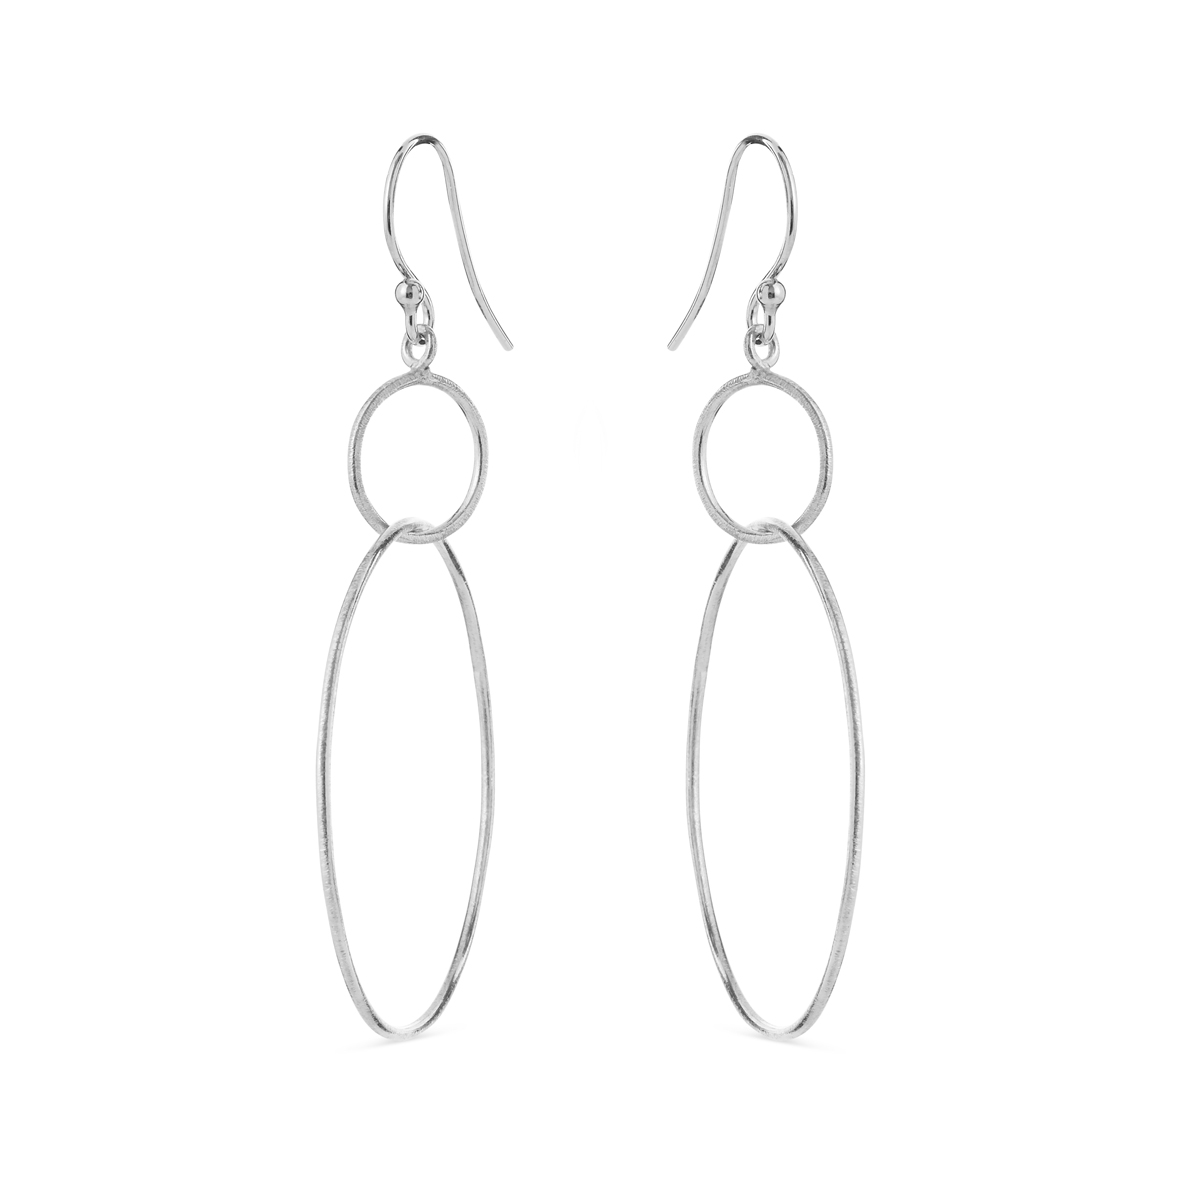 Sølv øreringe med 2 cirkler - 5575-1